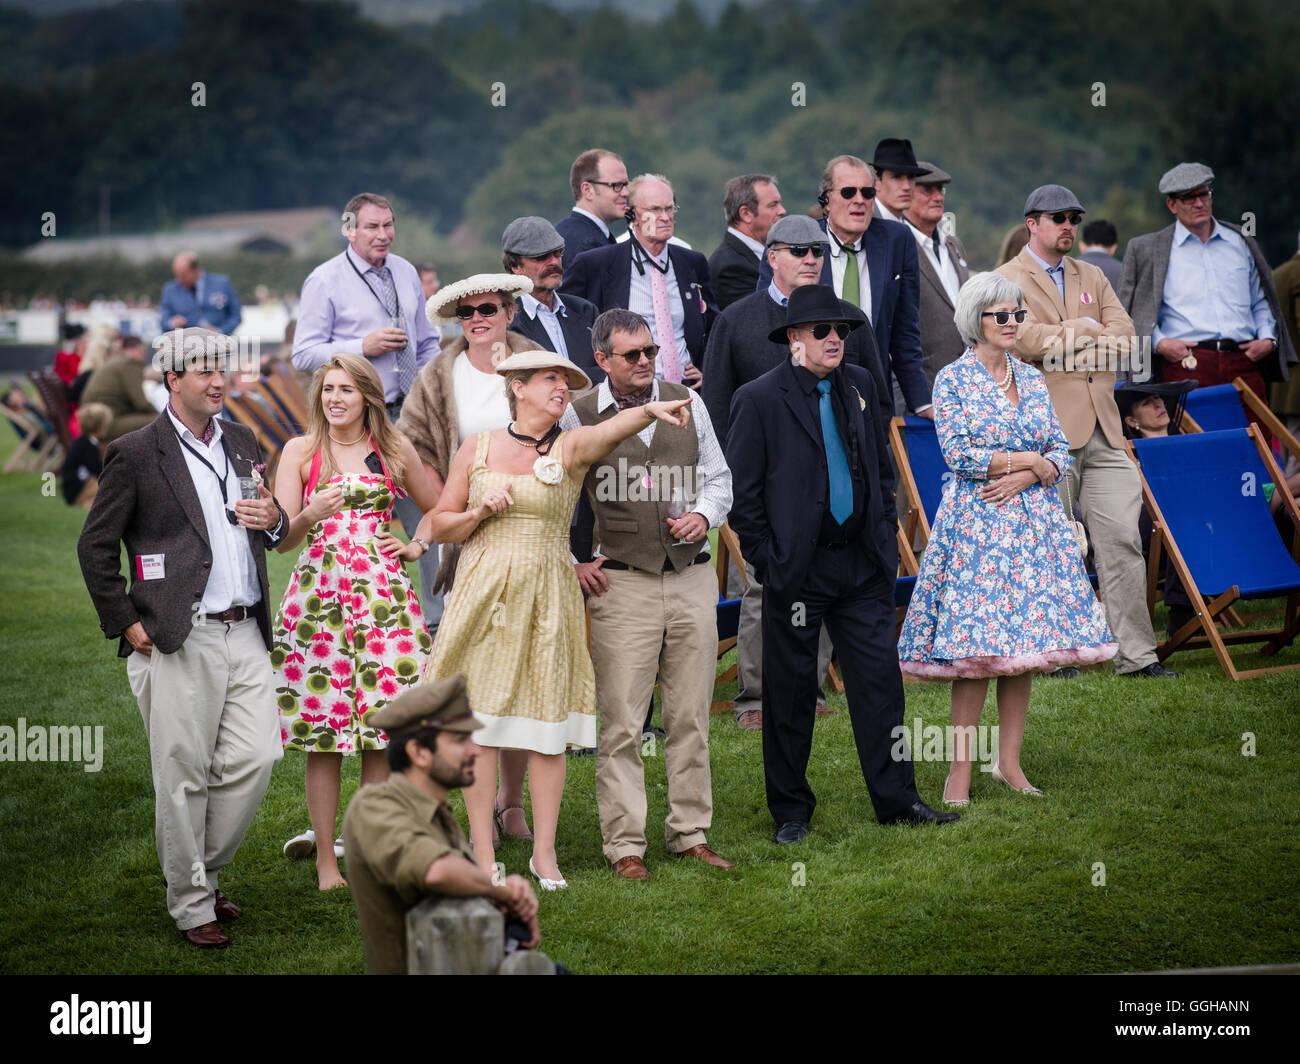 Besucher, Goodwood Revival 2014, Rennsport, Oldtimer, Goodwood, Chichester, Sussex, England, Großbritannien Stockbild